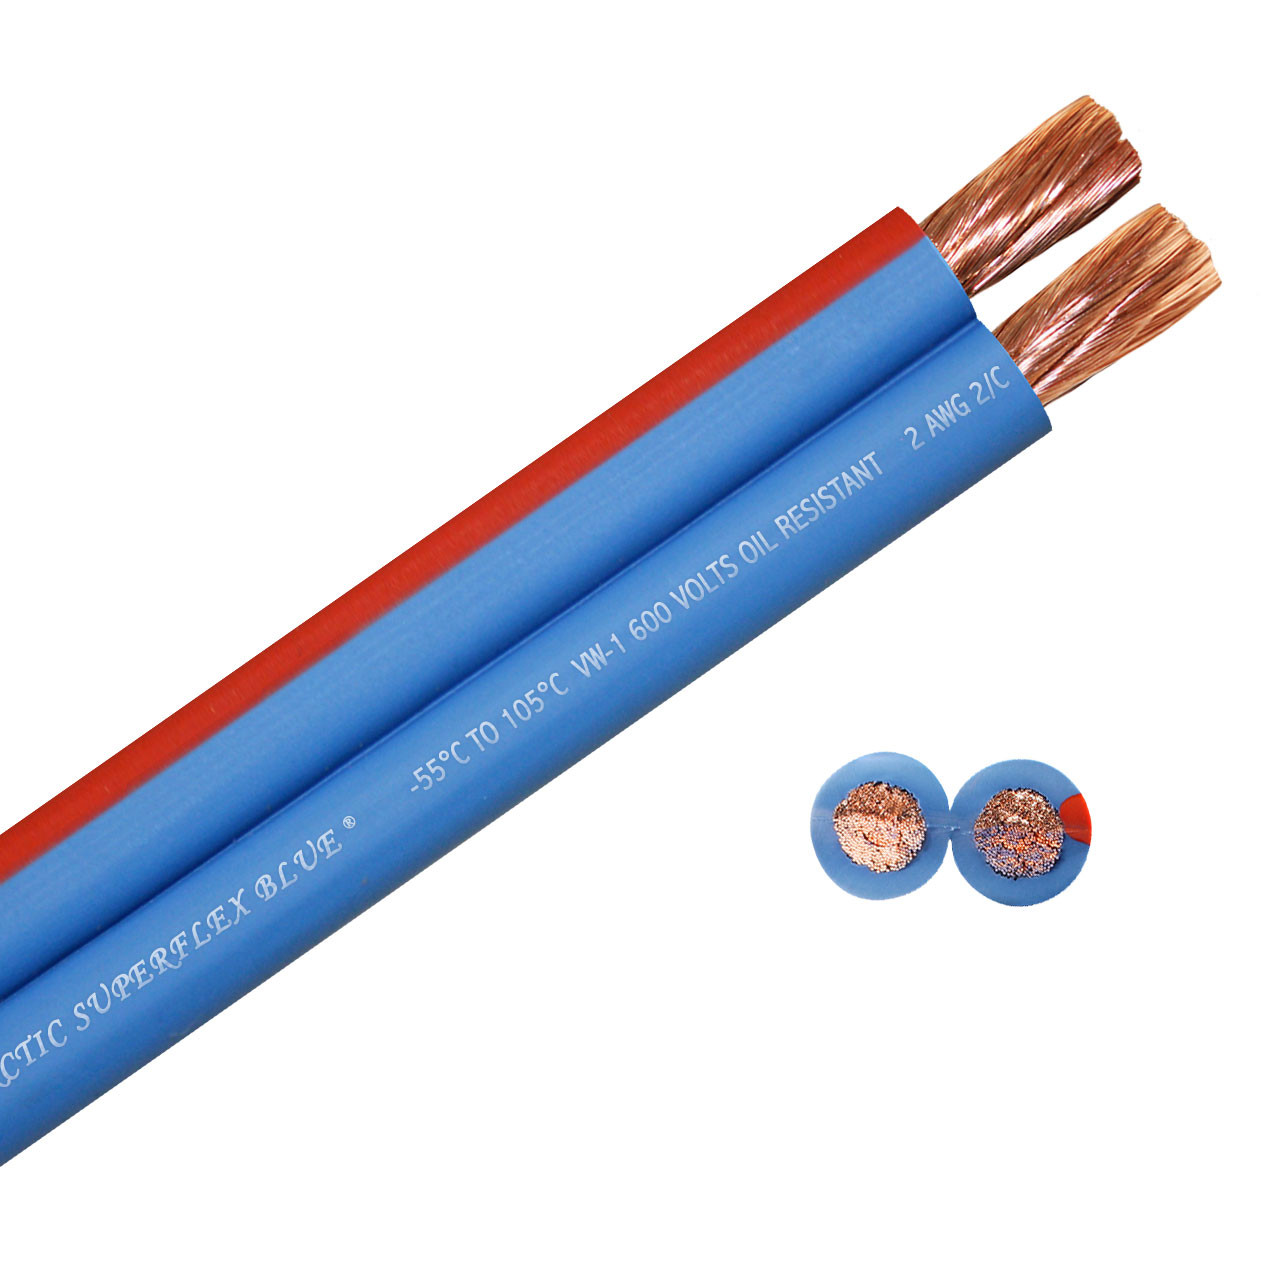 Arctic Superflex Blue 2 gauge twin wire - 100% copper fine strand conductors